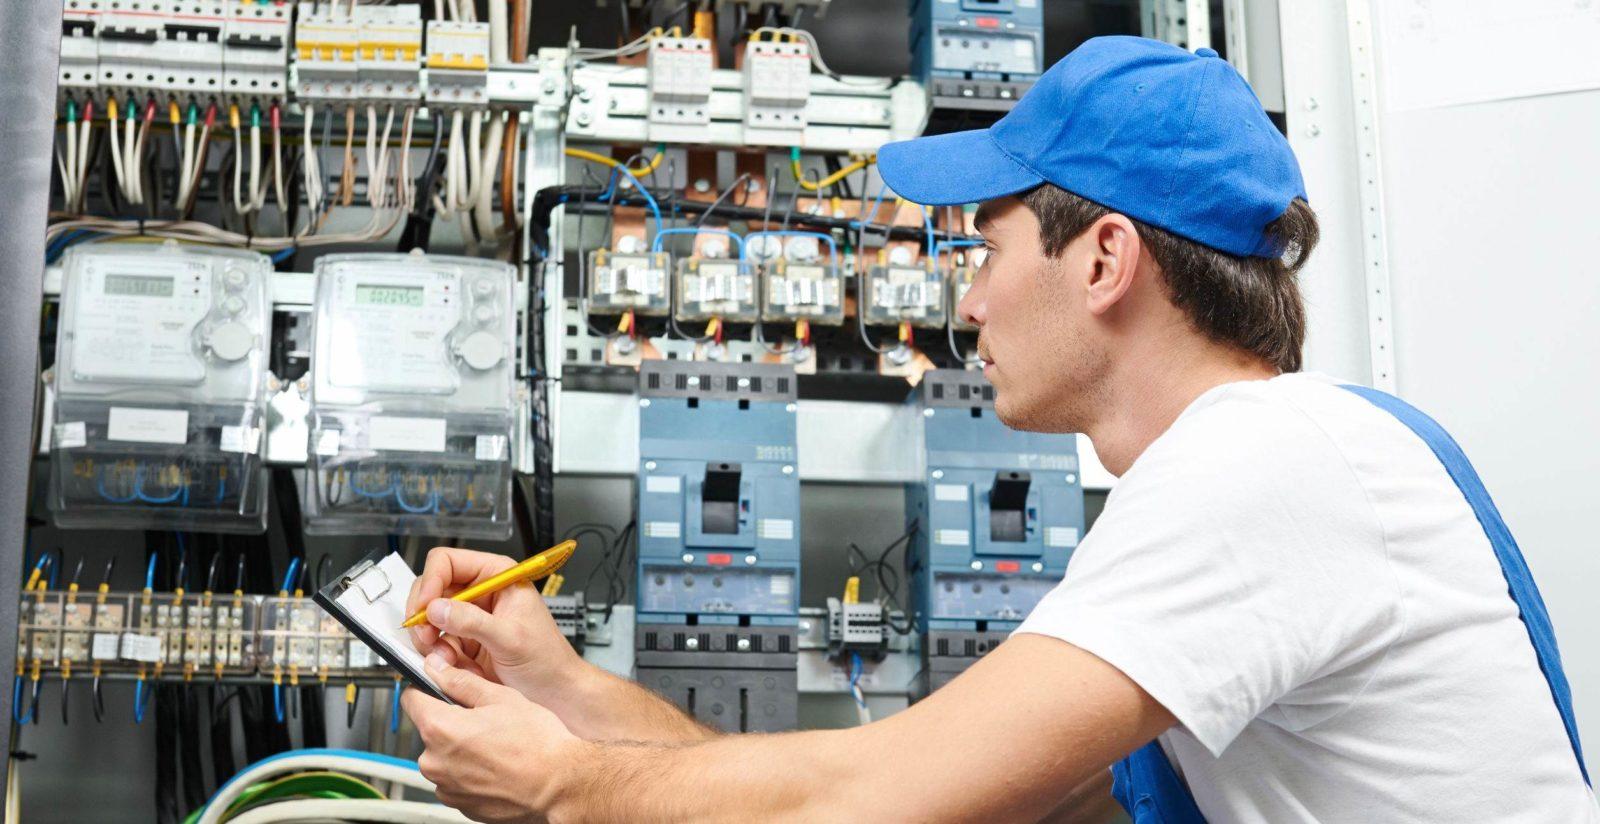 [:ua]кошторис на пусконалагоджувальні роботи електрообладнання[:ru]смета на пусконаладочные работы электрооборудования[:]